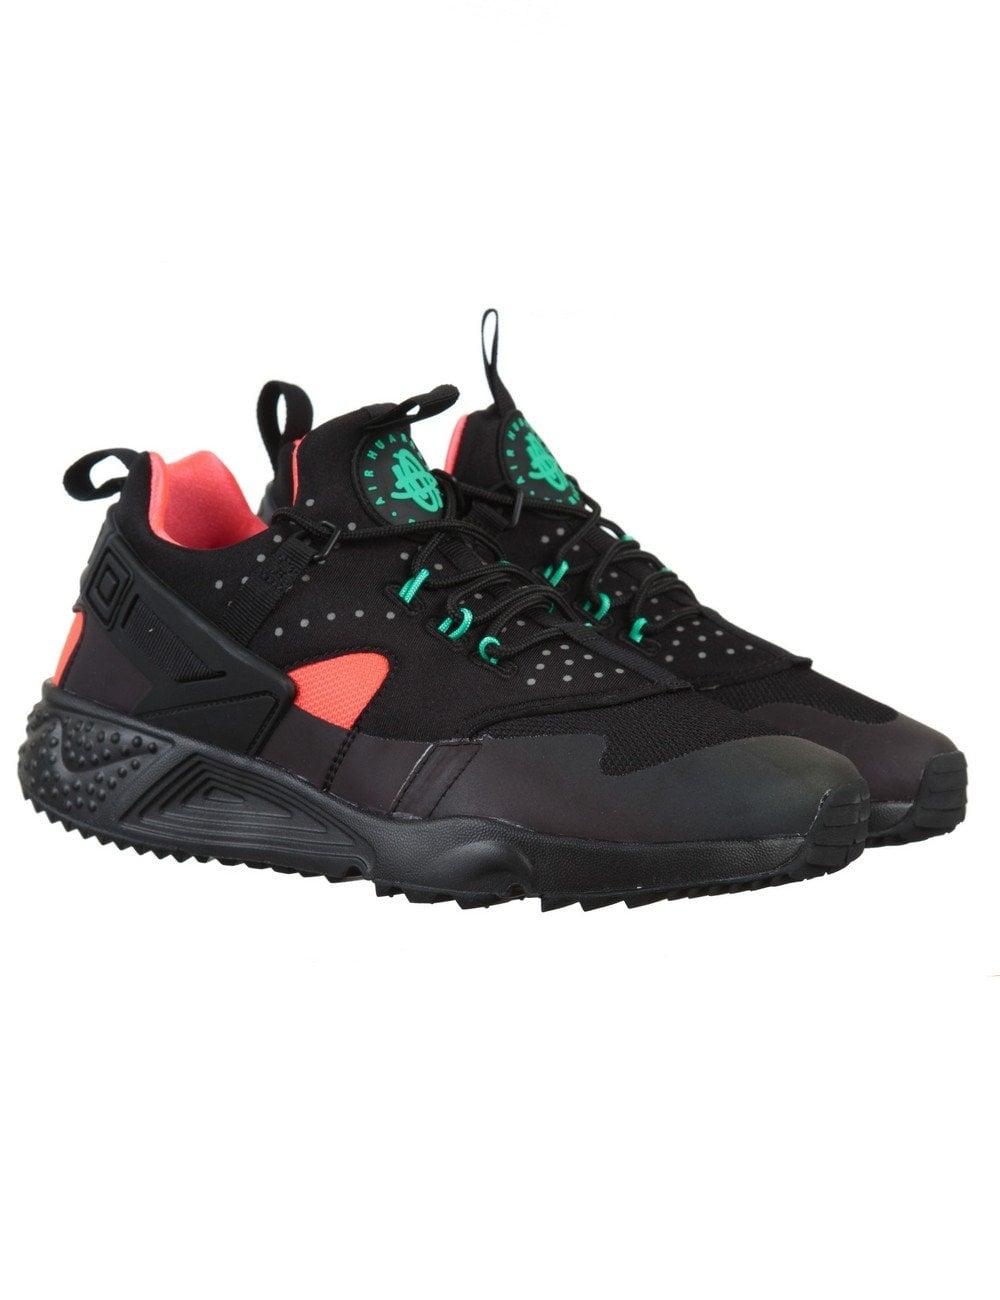 uznane marki jakość buty do separacji Air Huarache Utility Premium Shoes - Black/Black-Bright Crimson